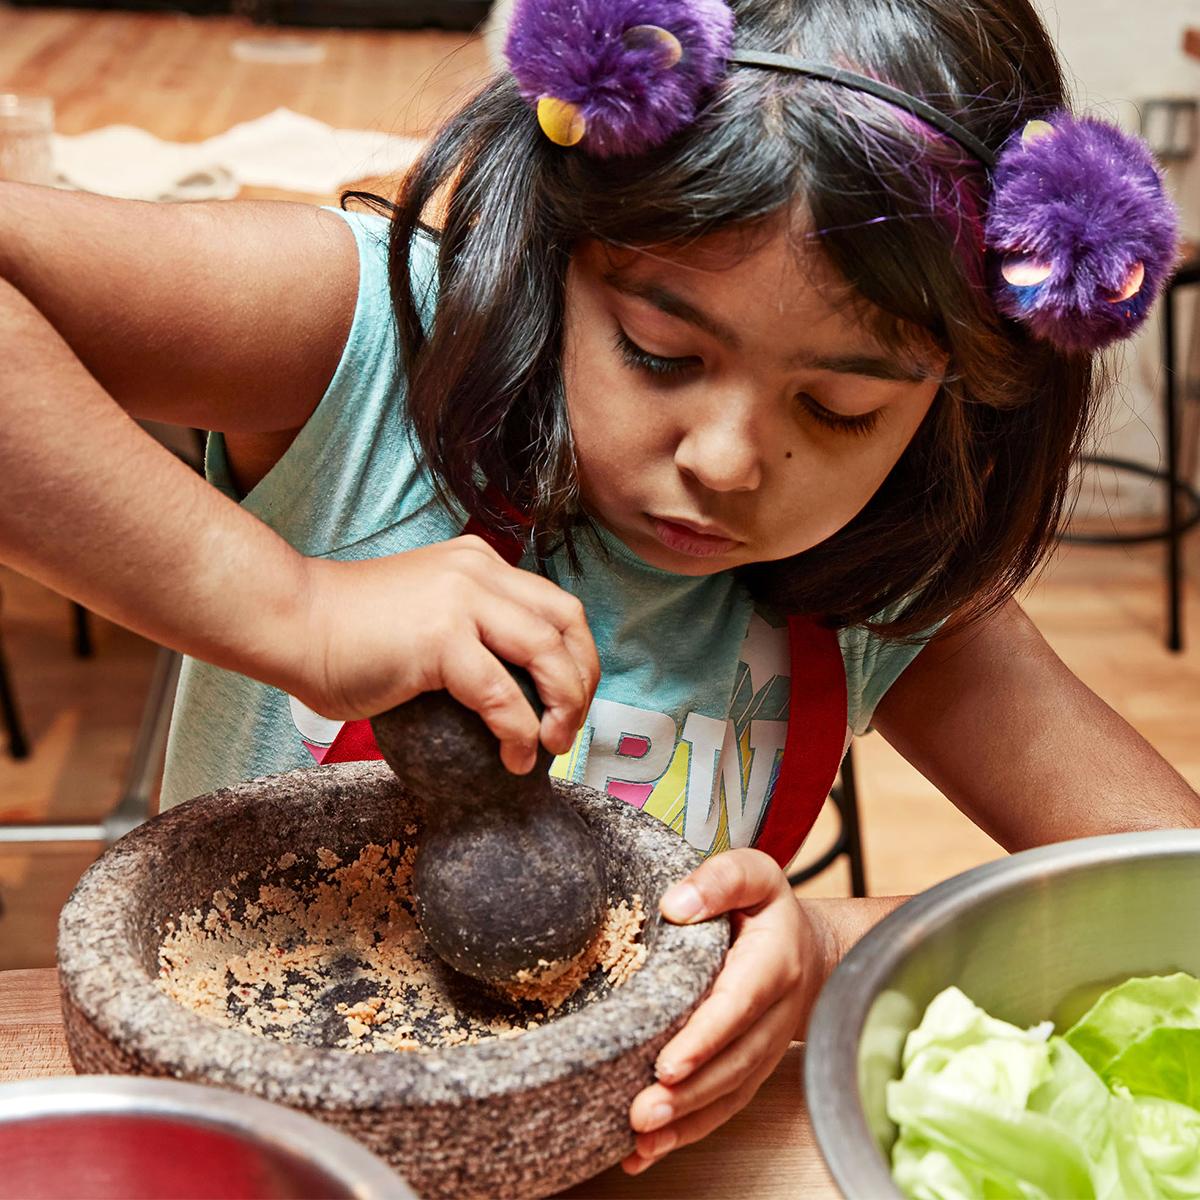 girl using mortar and pestle